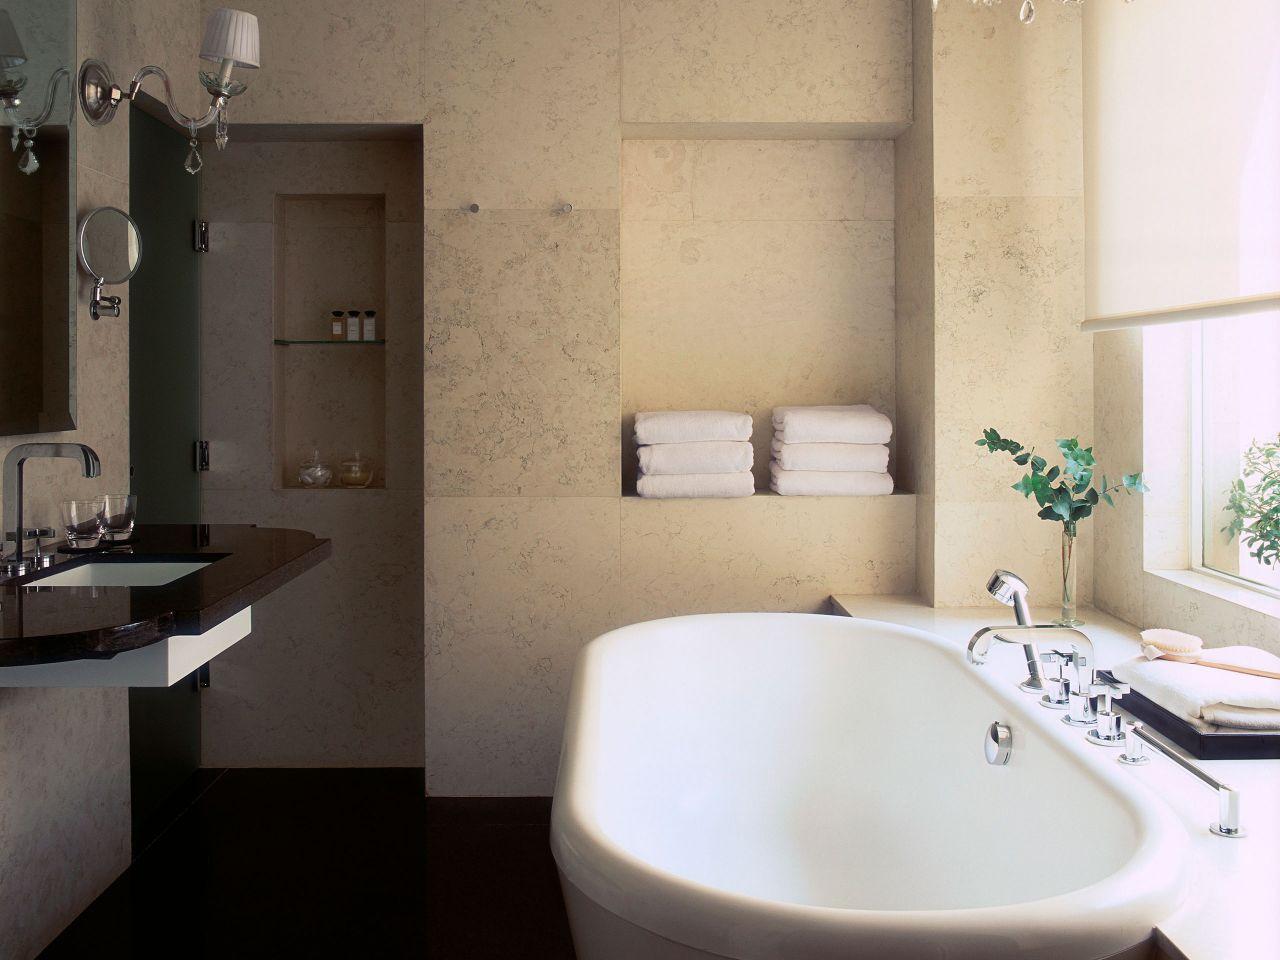 Boudoir Suite bathroom, large soaking tub